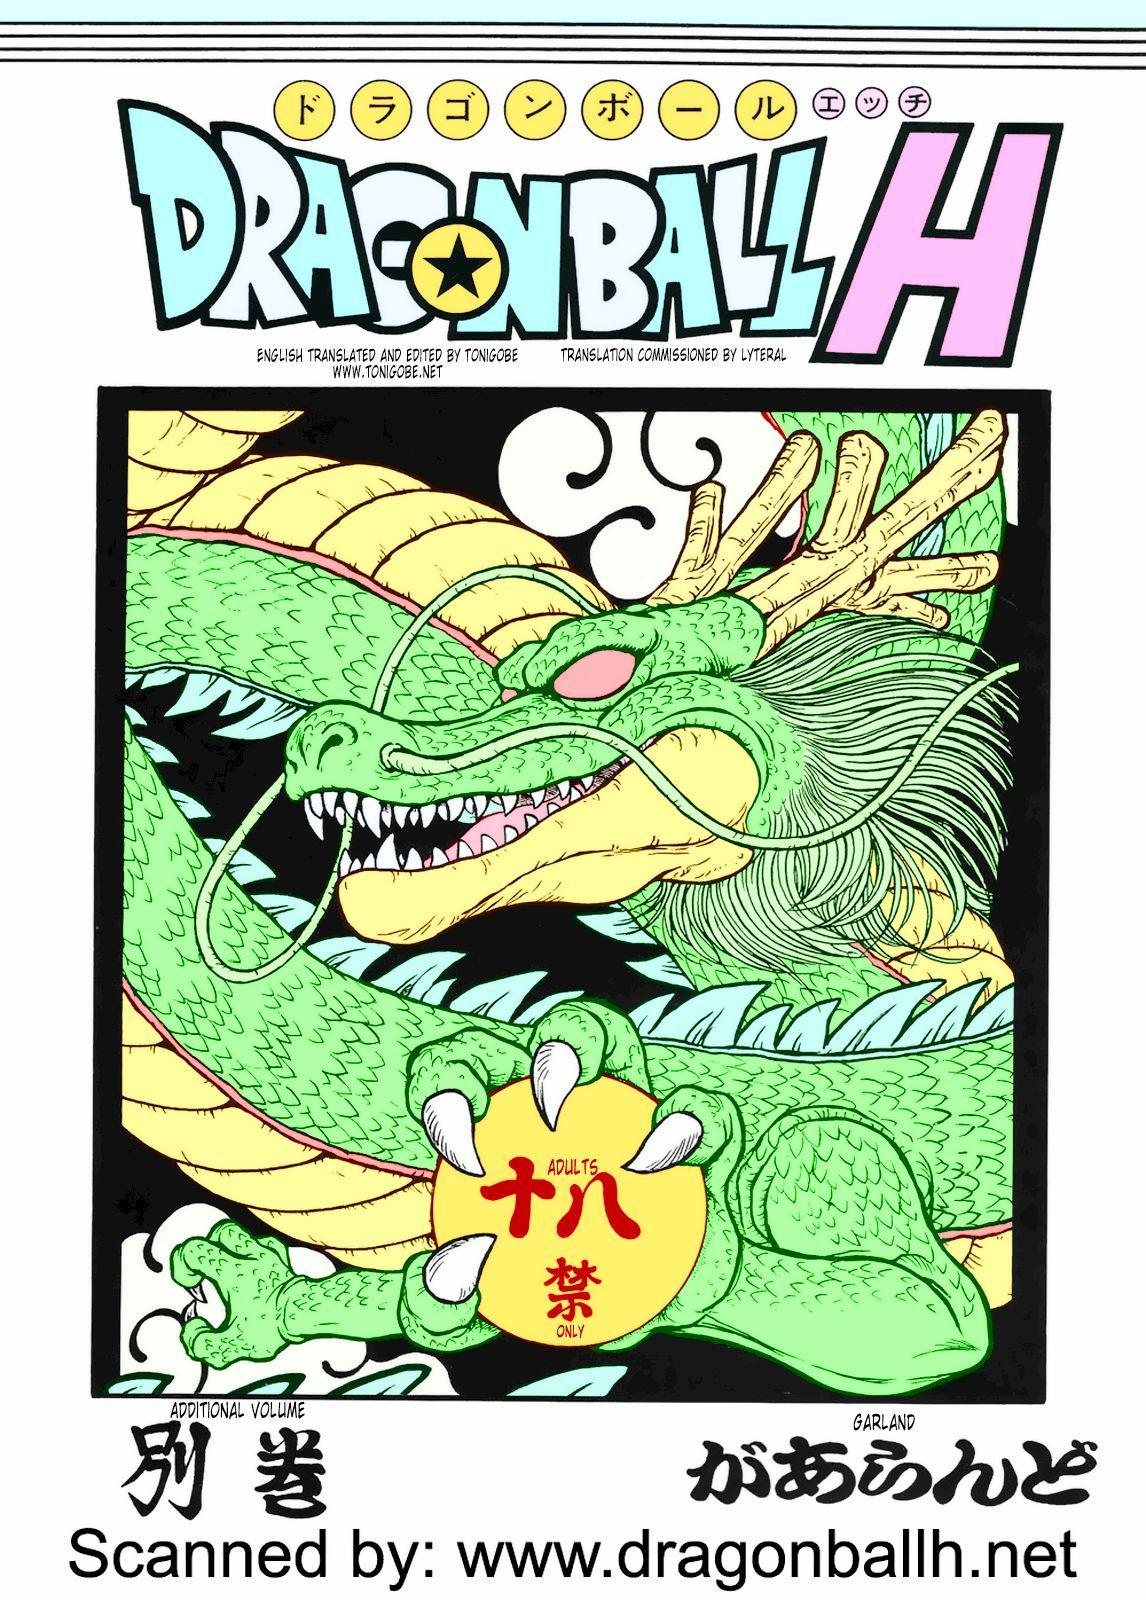 Dragon Ball H Bekkan |  Dragonball H Extra Issue 0